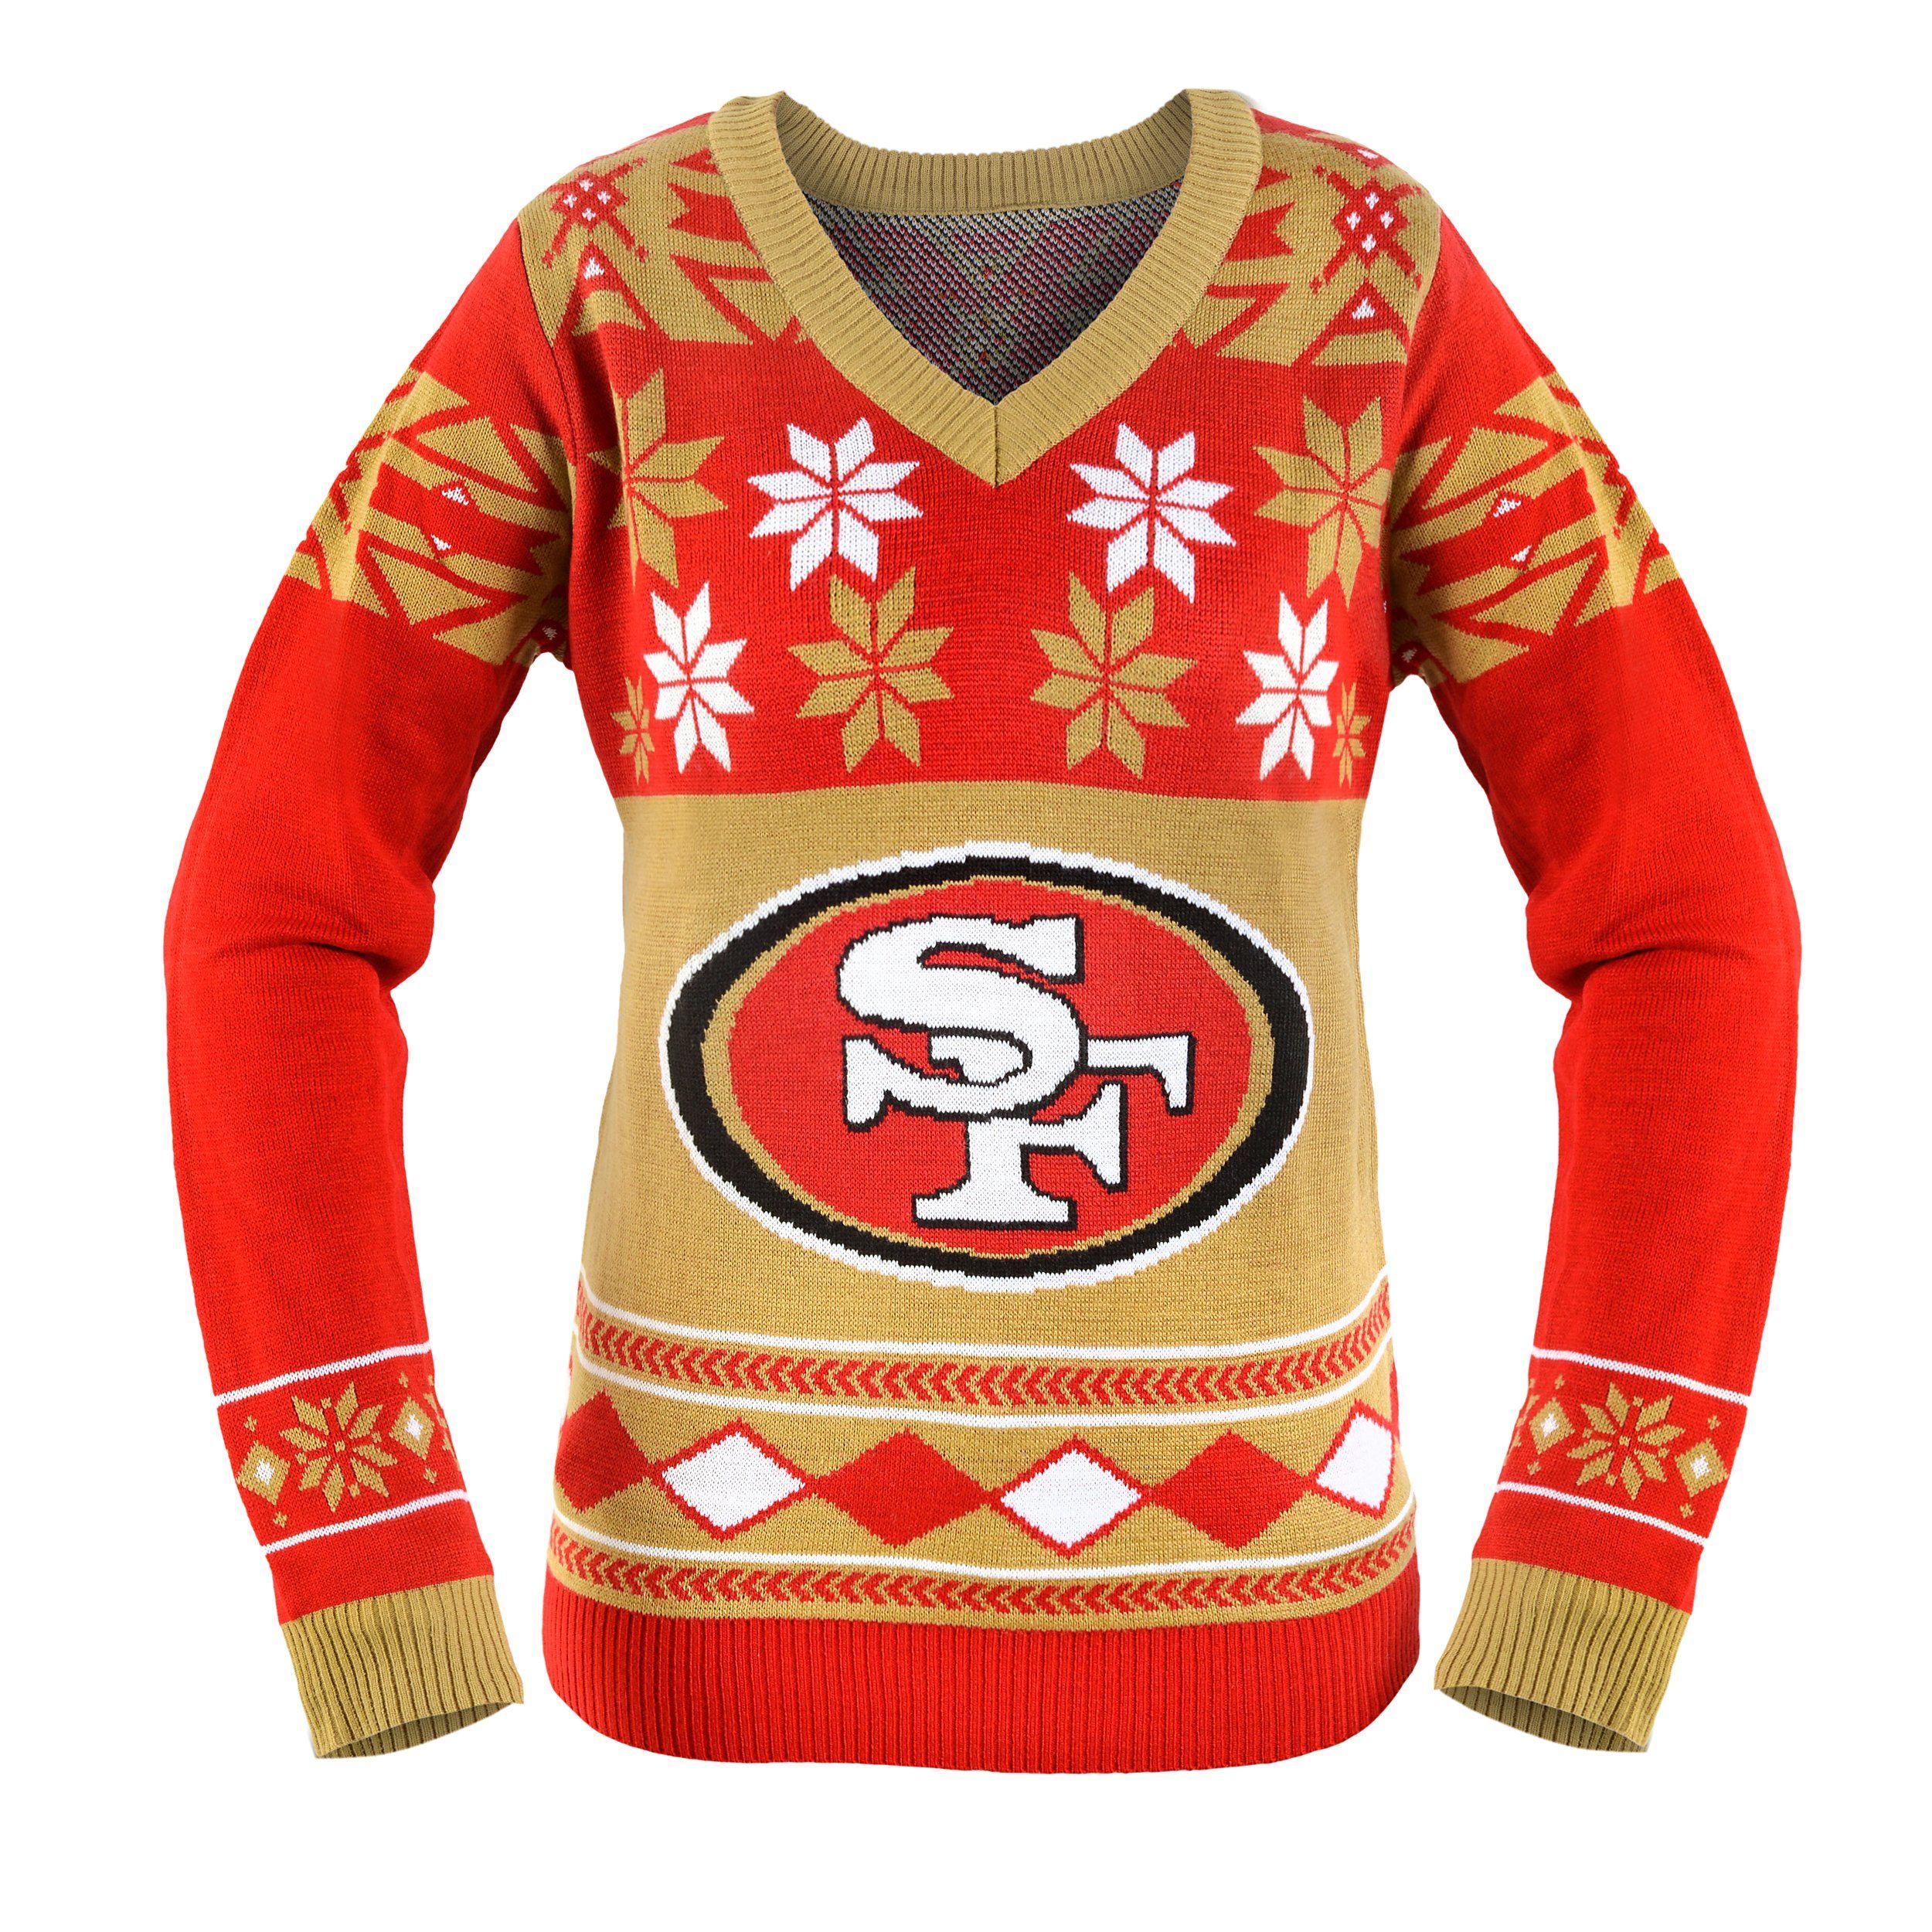 San Francisco 49ers Ugly Christmas Sweaters | Football | Pinterest ...